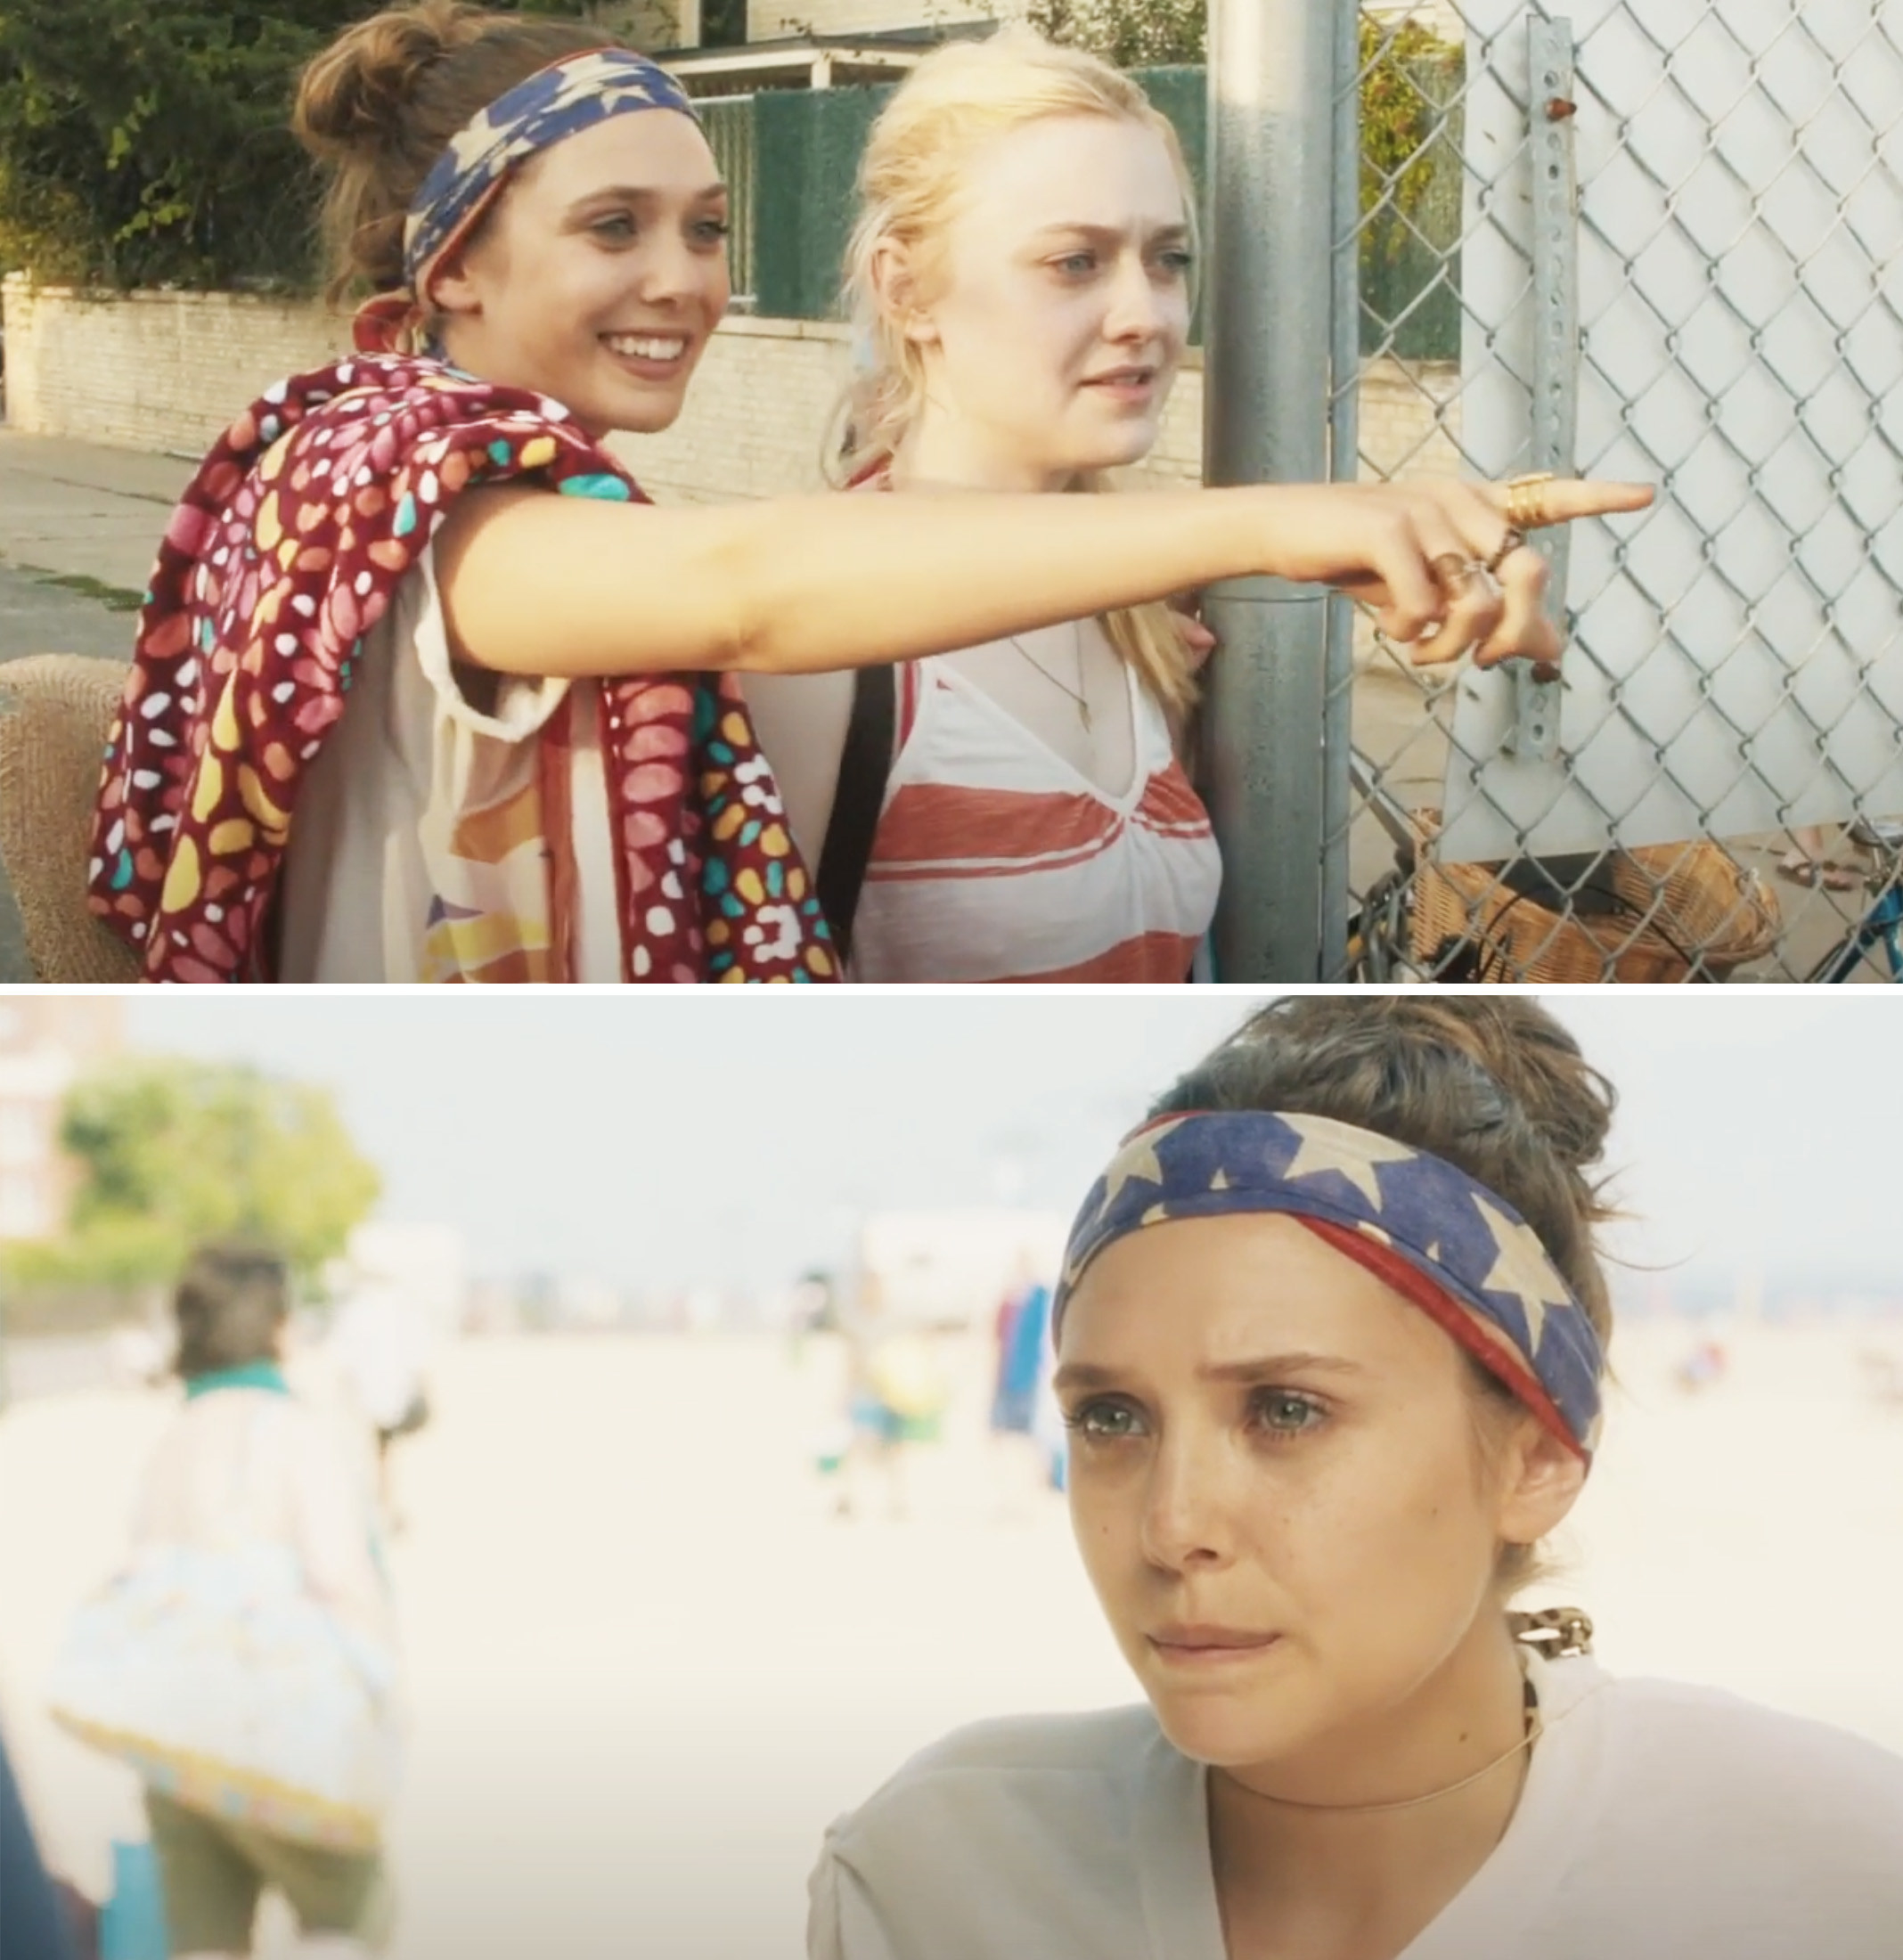 Elizabeth Olsen and Dakota Fanning in Very Good Girls